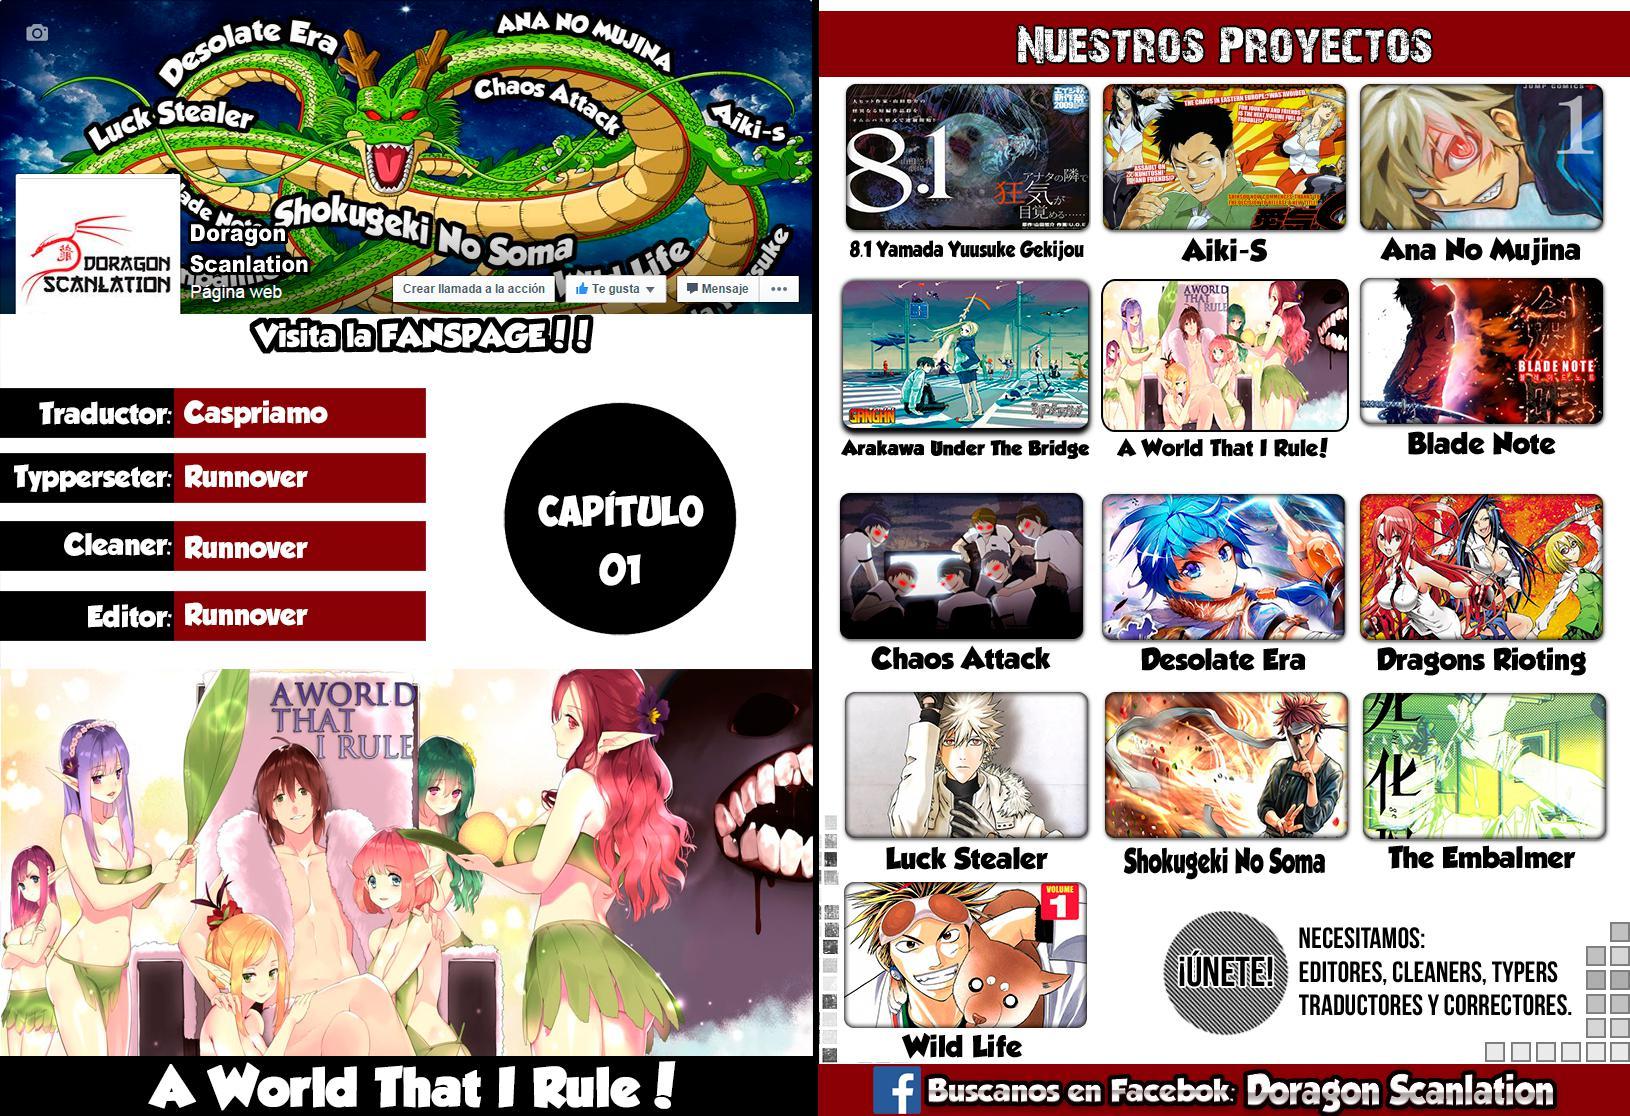 https://c5.ninemanga.com/es_manga/26/18714/435199/be80bade551749c48998e122df7e02fc.jpg Page 1